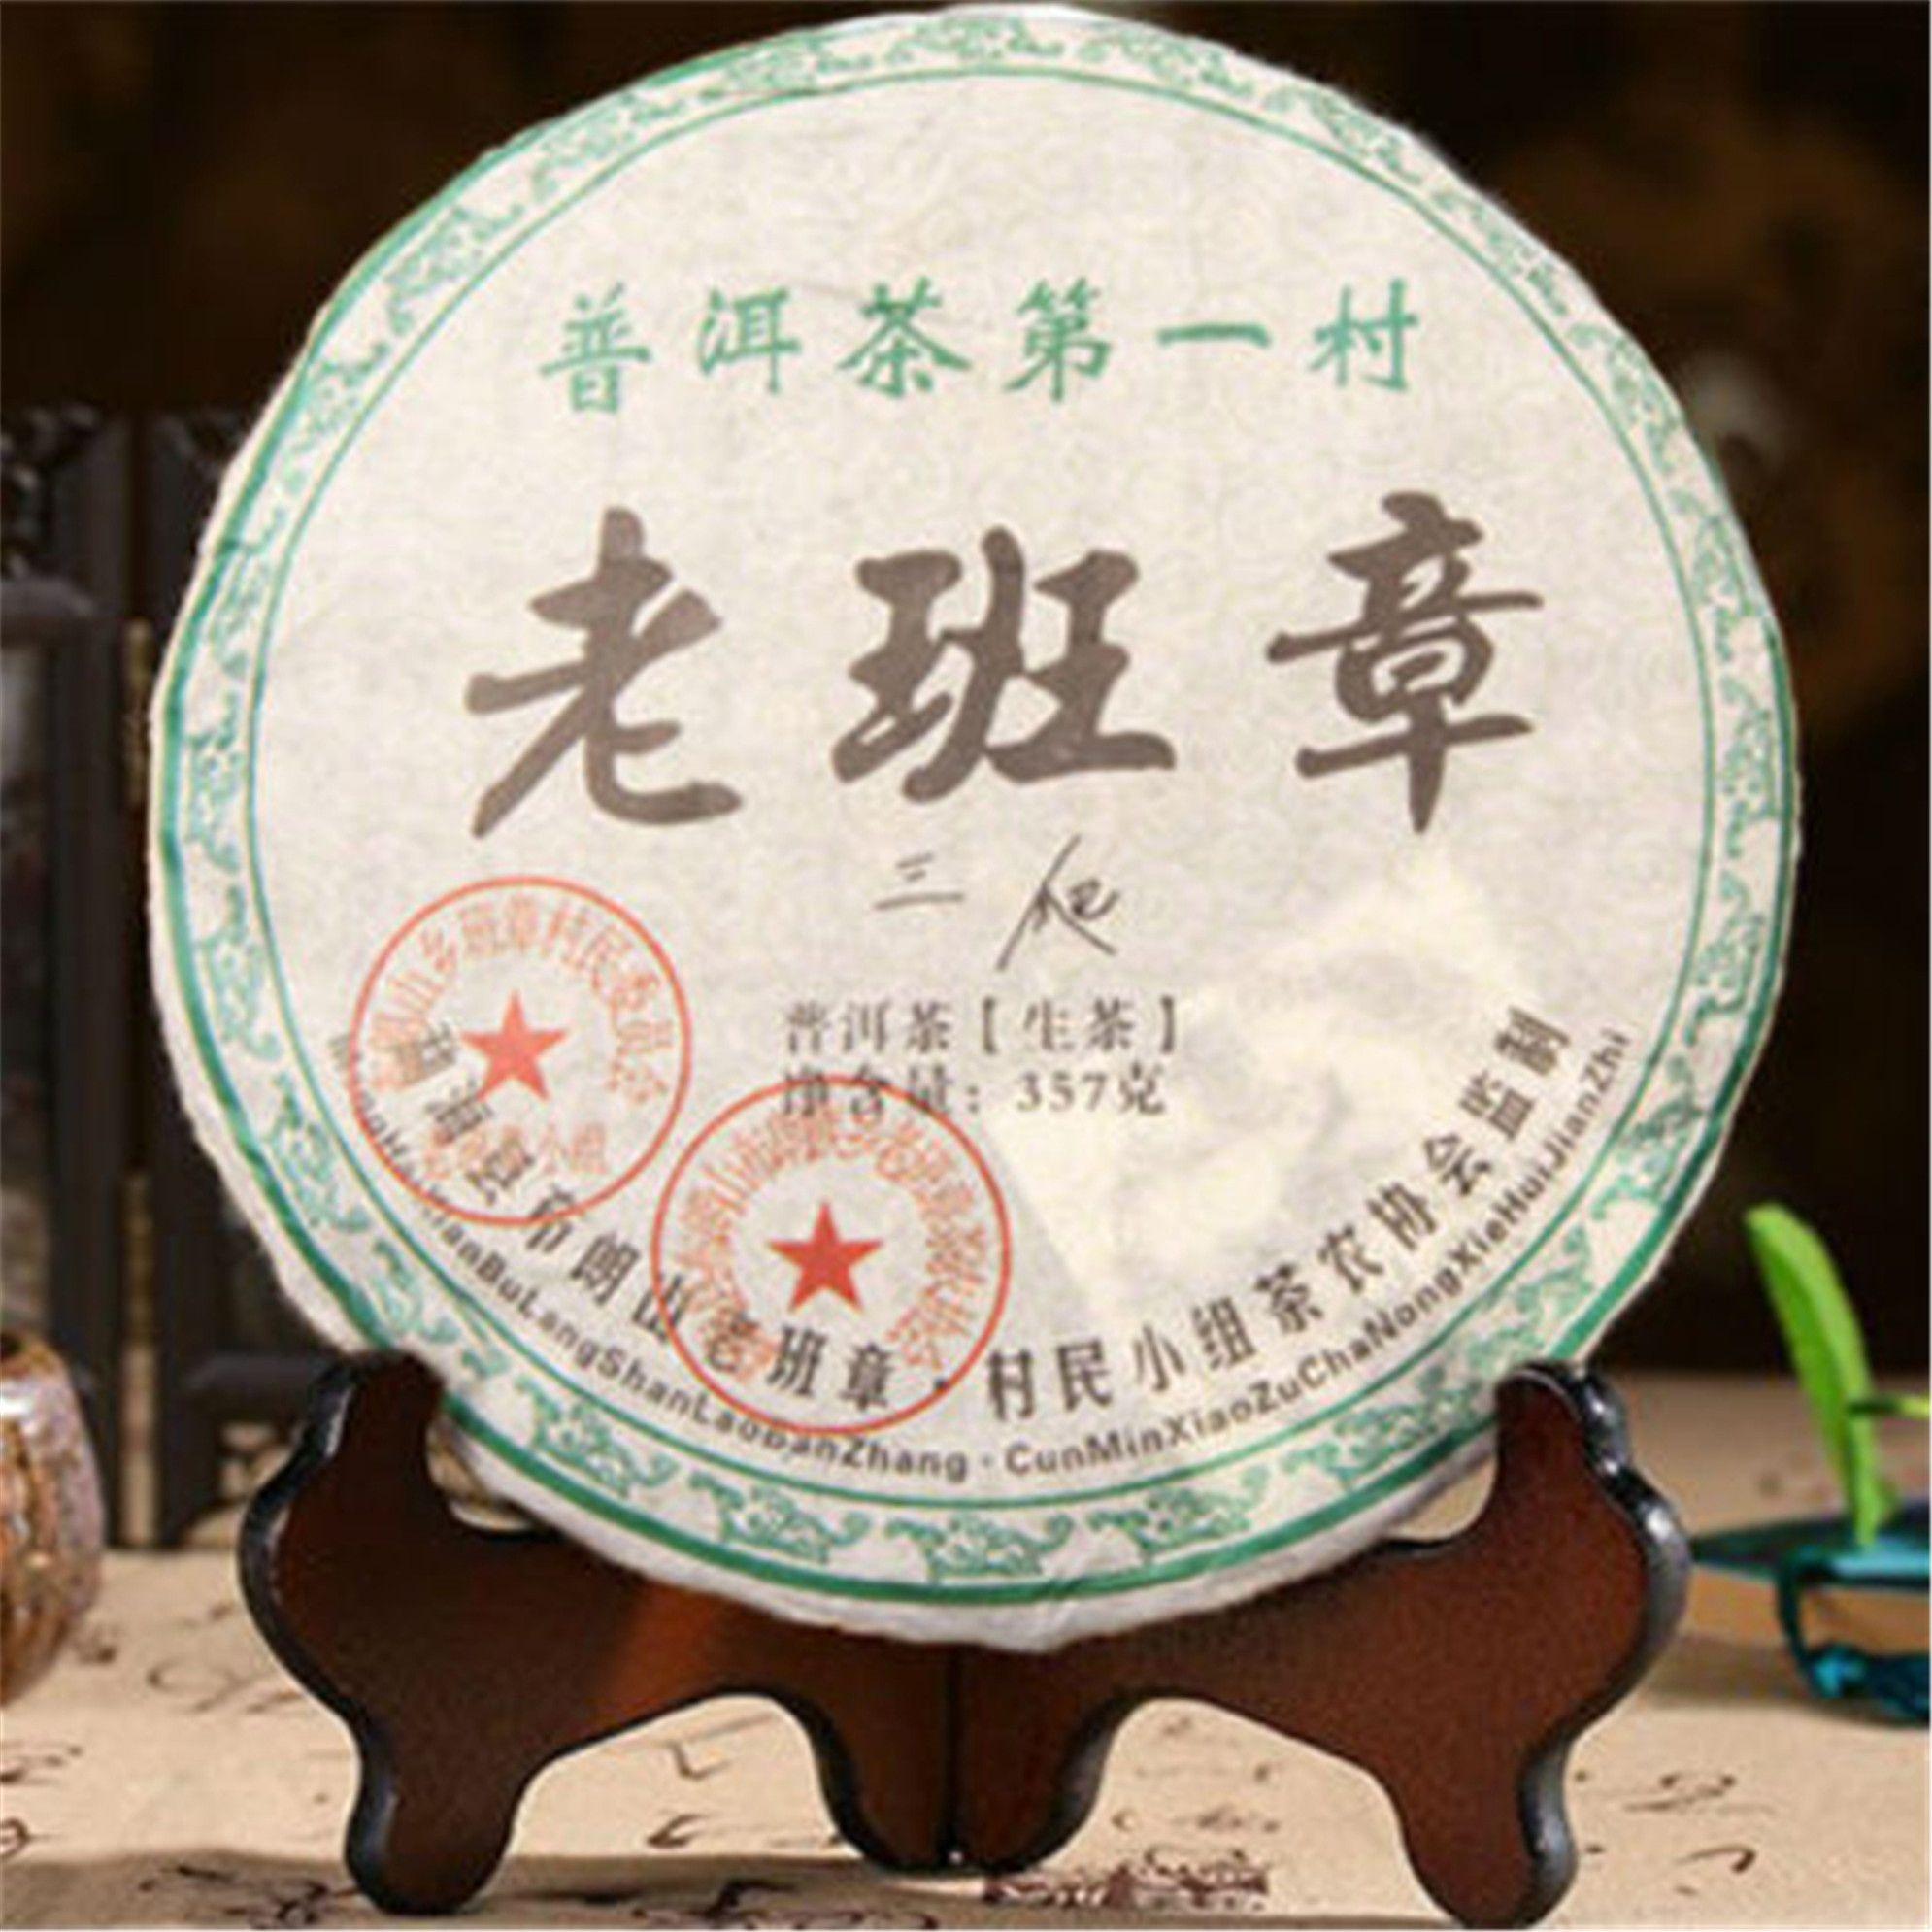 Preference 357g Yunnan classic Old Banzhang Pu'er Tea Raw Pu Er Tea Organic Pu'er Old Tree Green Puer Natural Puerh Tea Cake